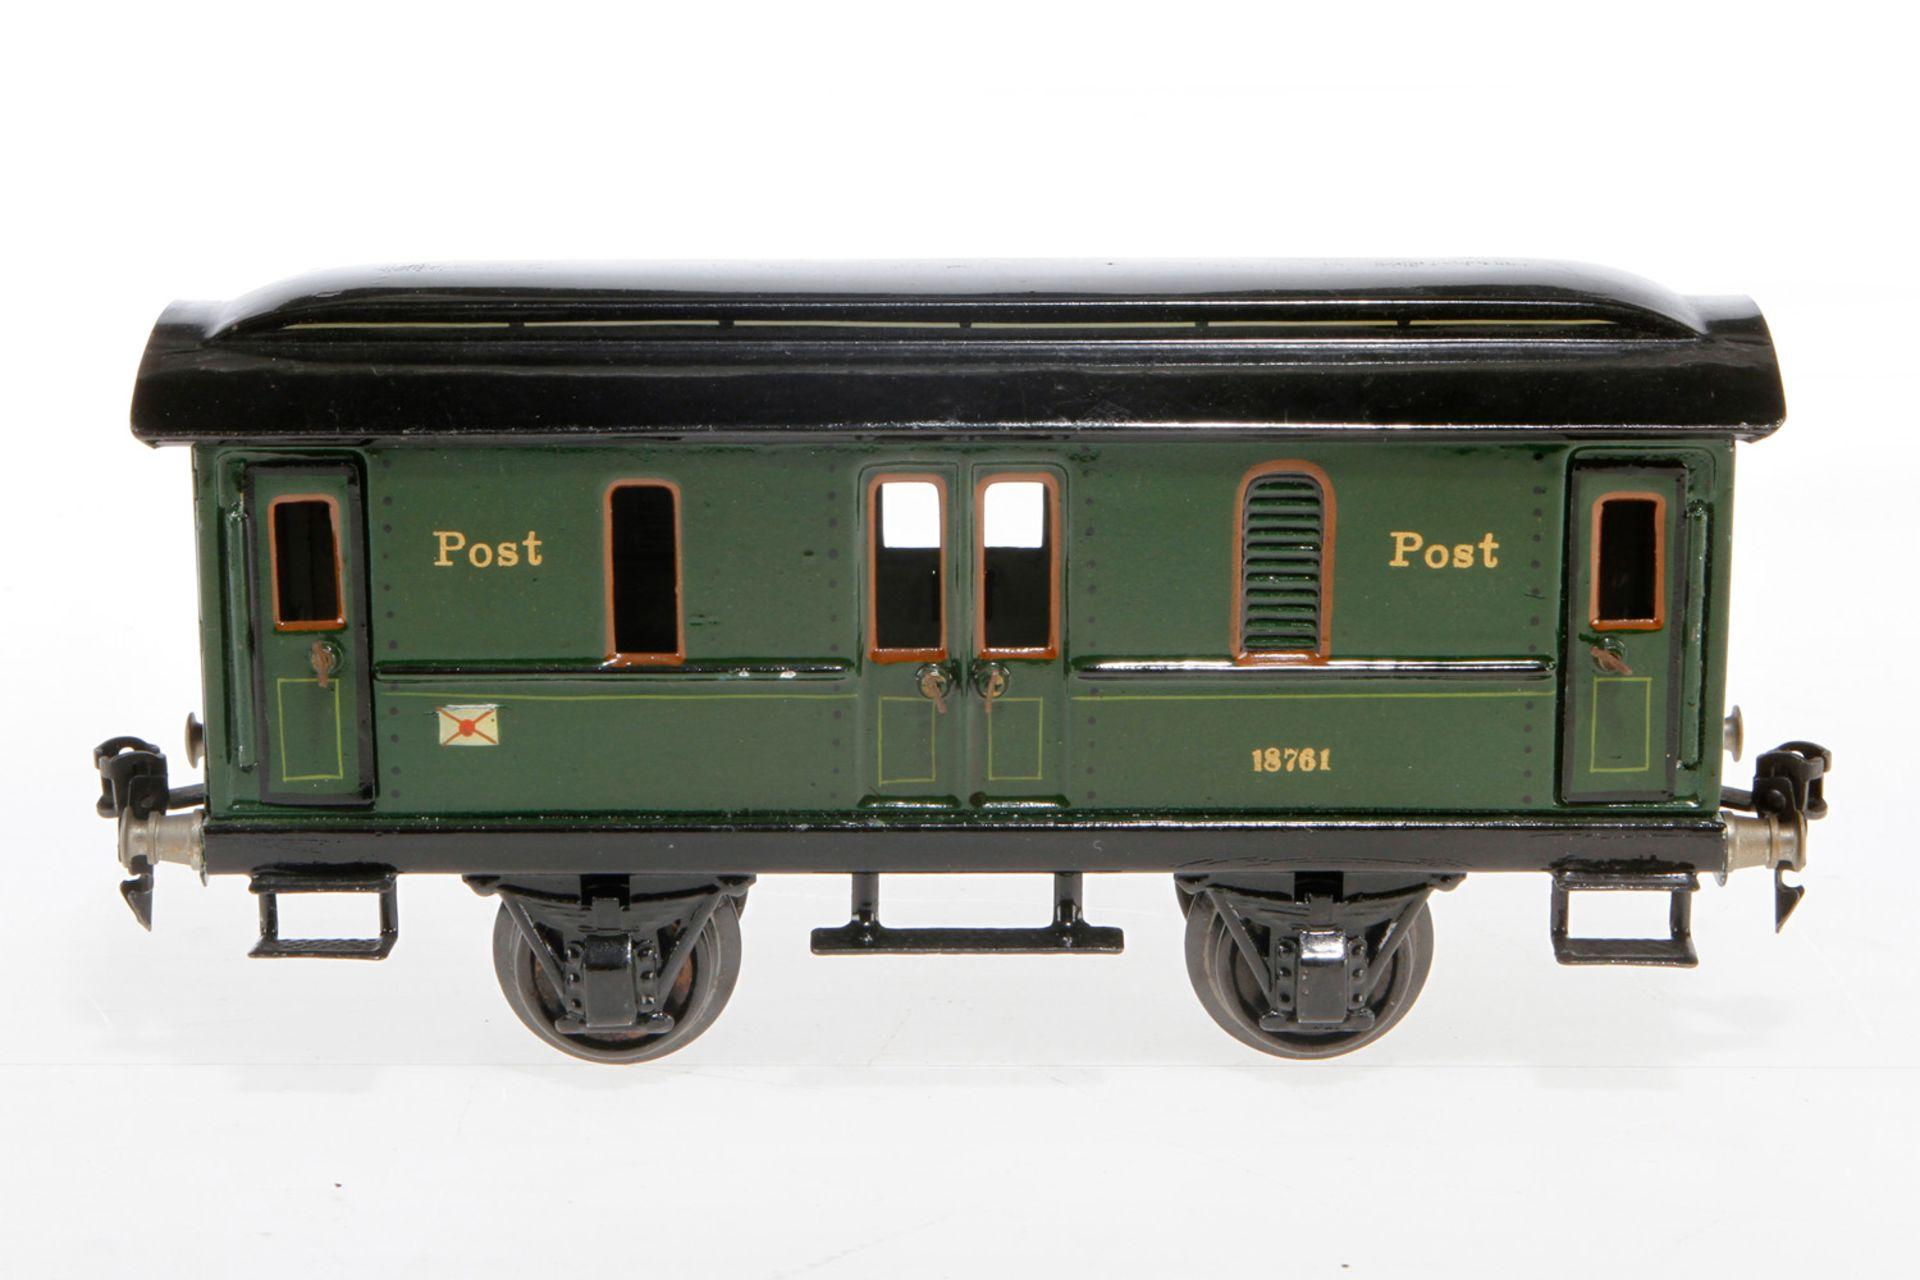 Märklin Postwagen 1876, S 1, HL, mit 4 AT, LS und gealterter Lack, L 24, sonst noch Z 2